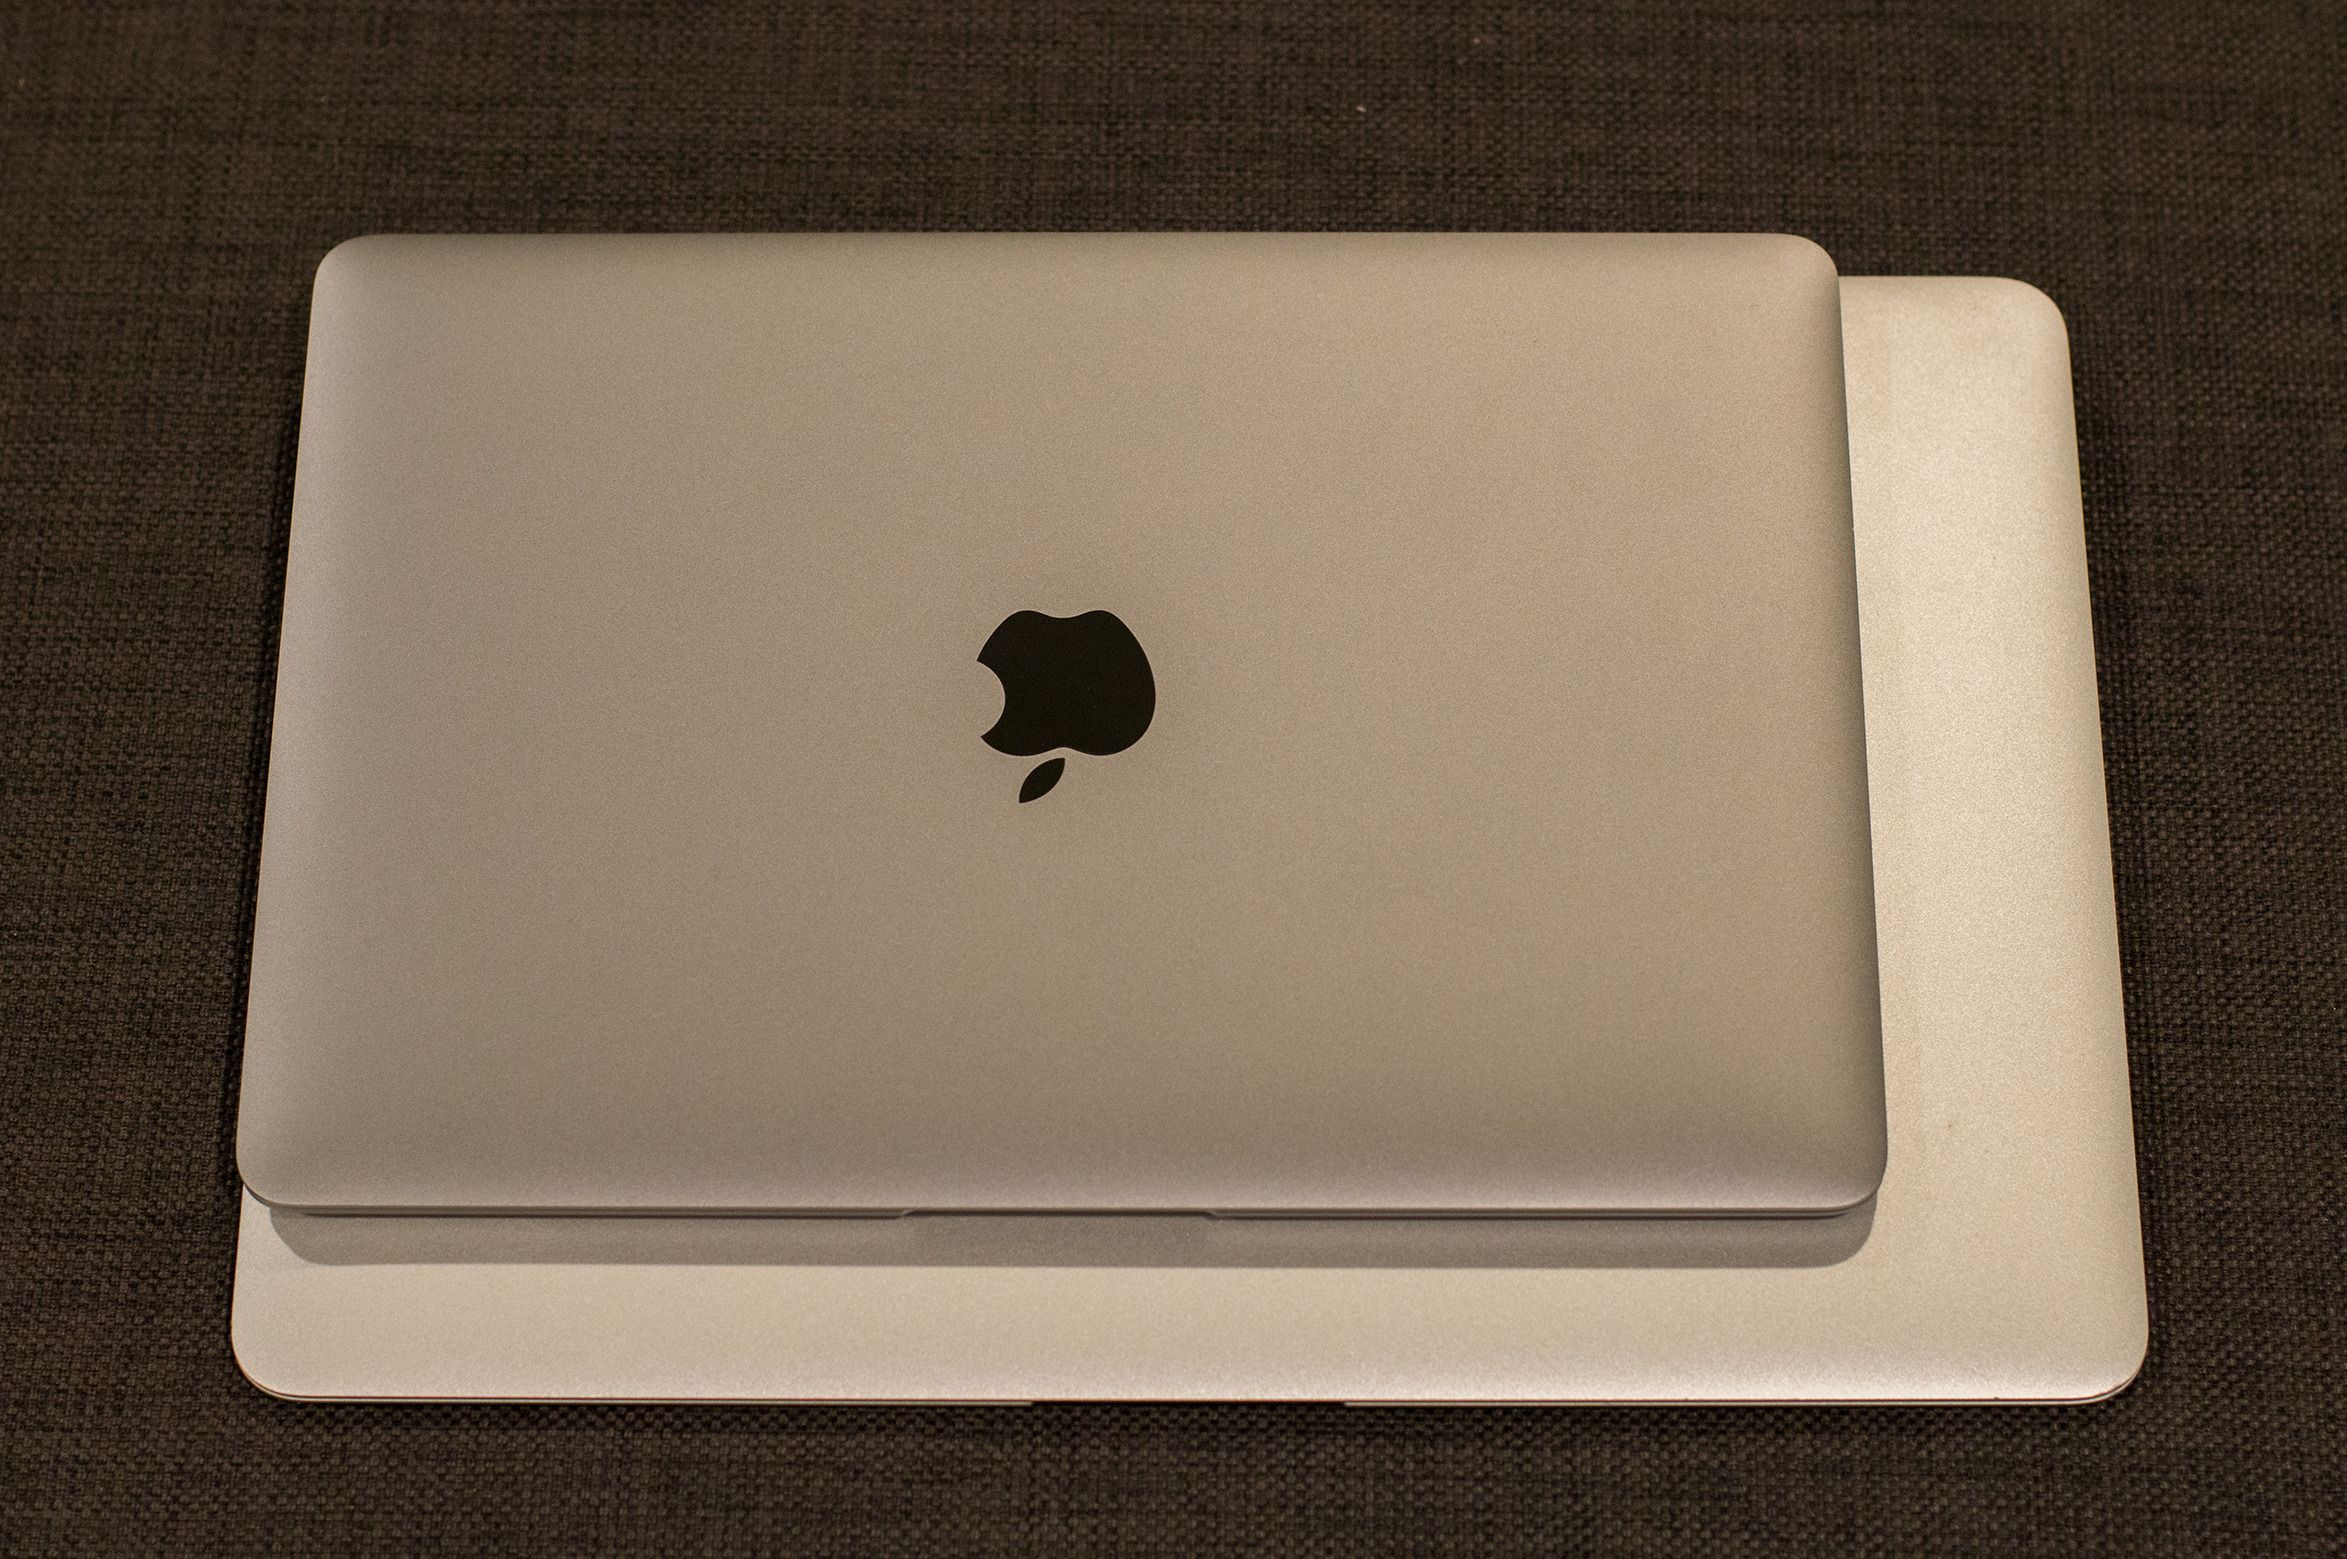 MacBook er mye mindre enn en MacBook Pro. Foto: Anders Brattensborg Smedsrud, Tek.no